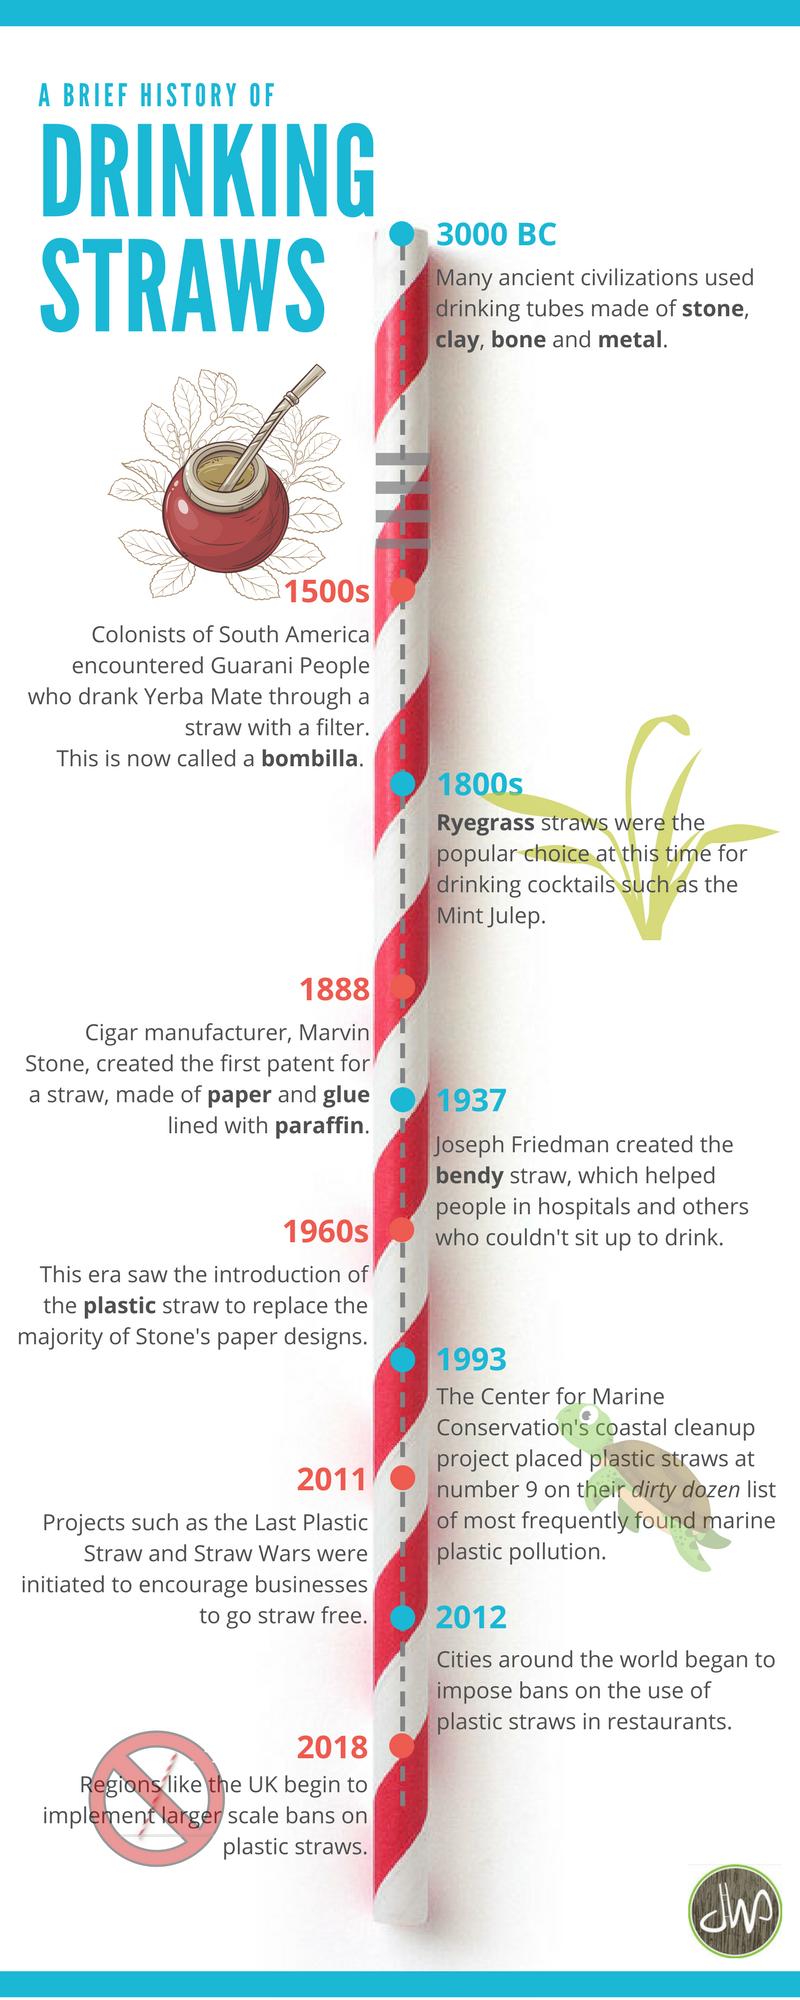 Straws, Plastic, History of Straws, Plastic Straw